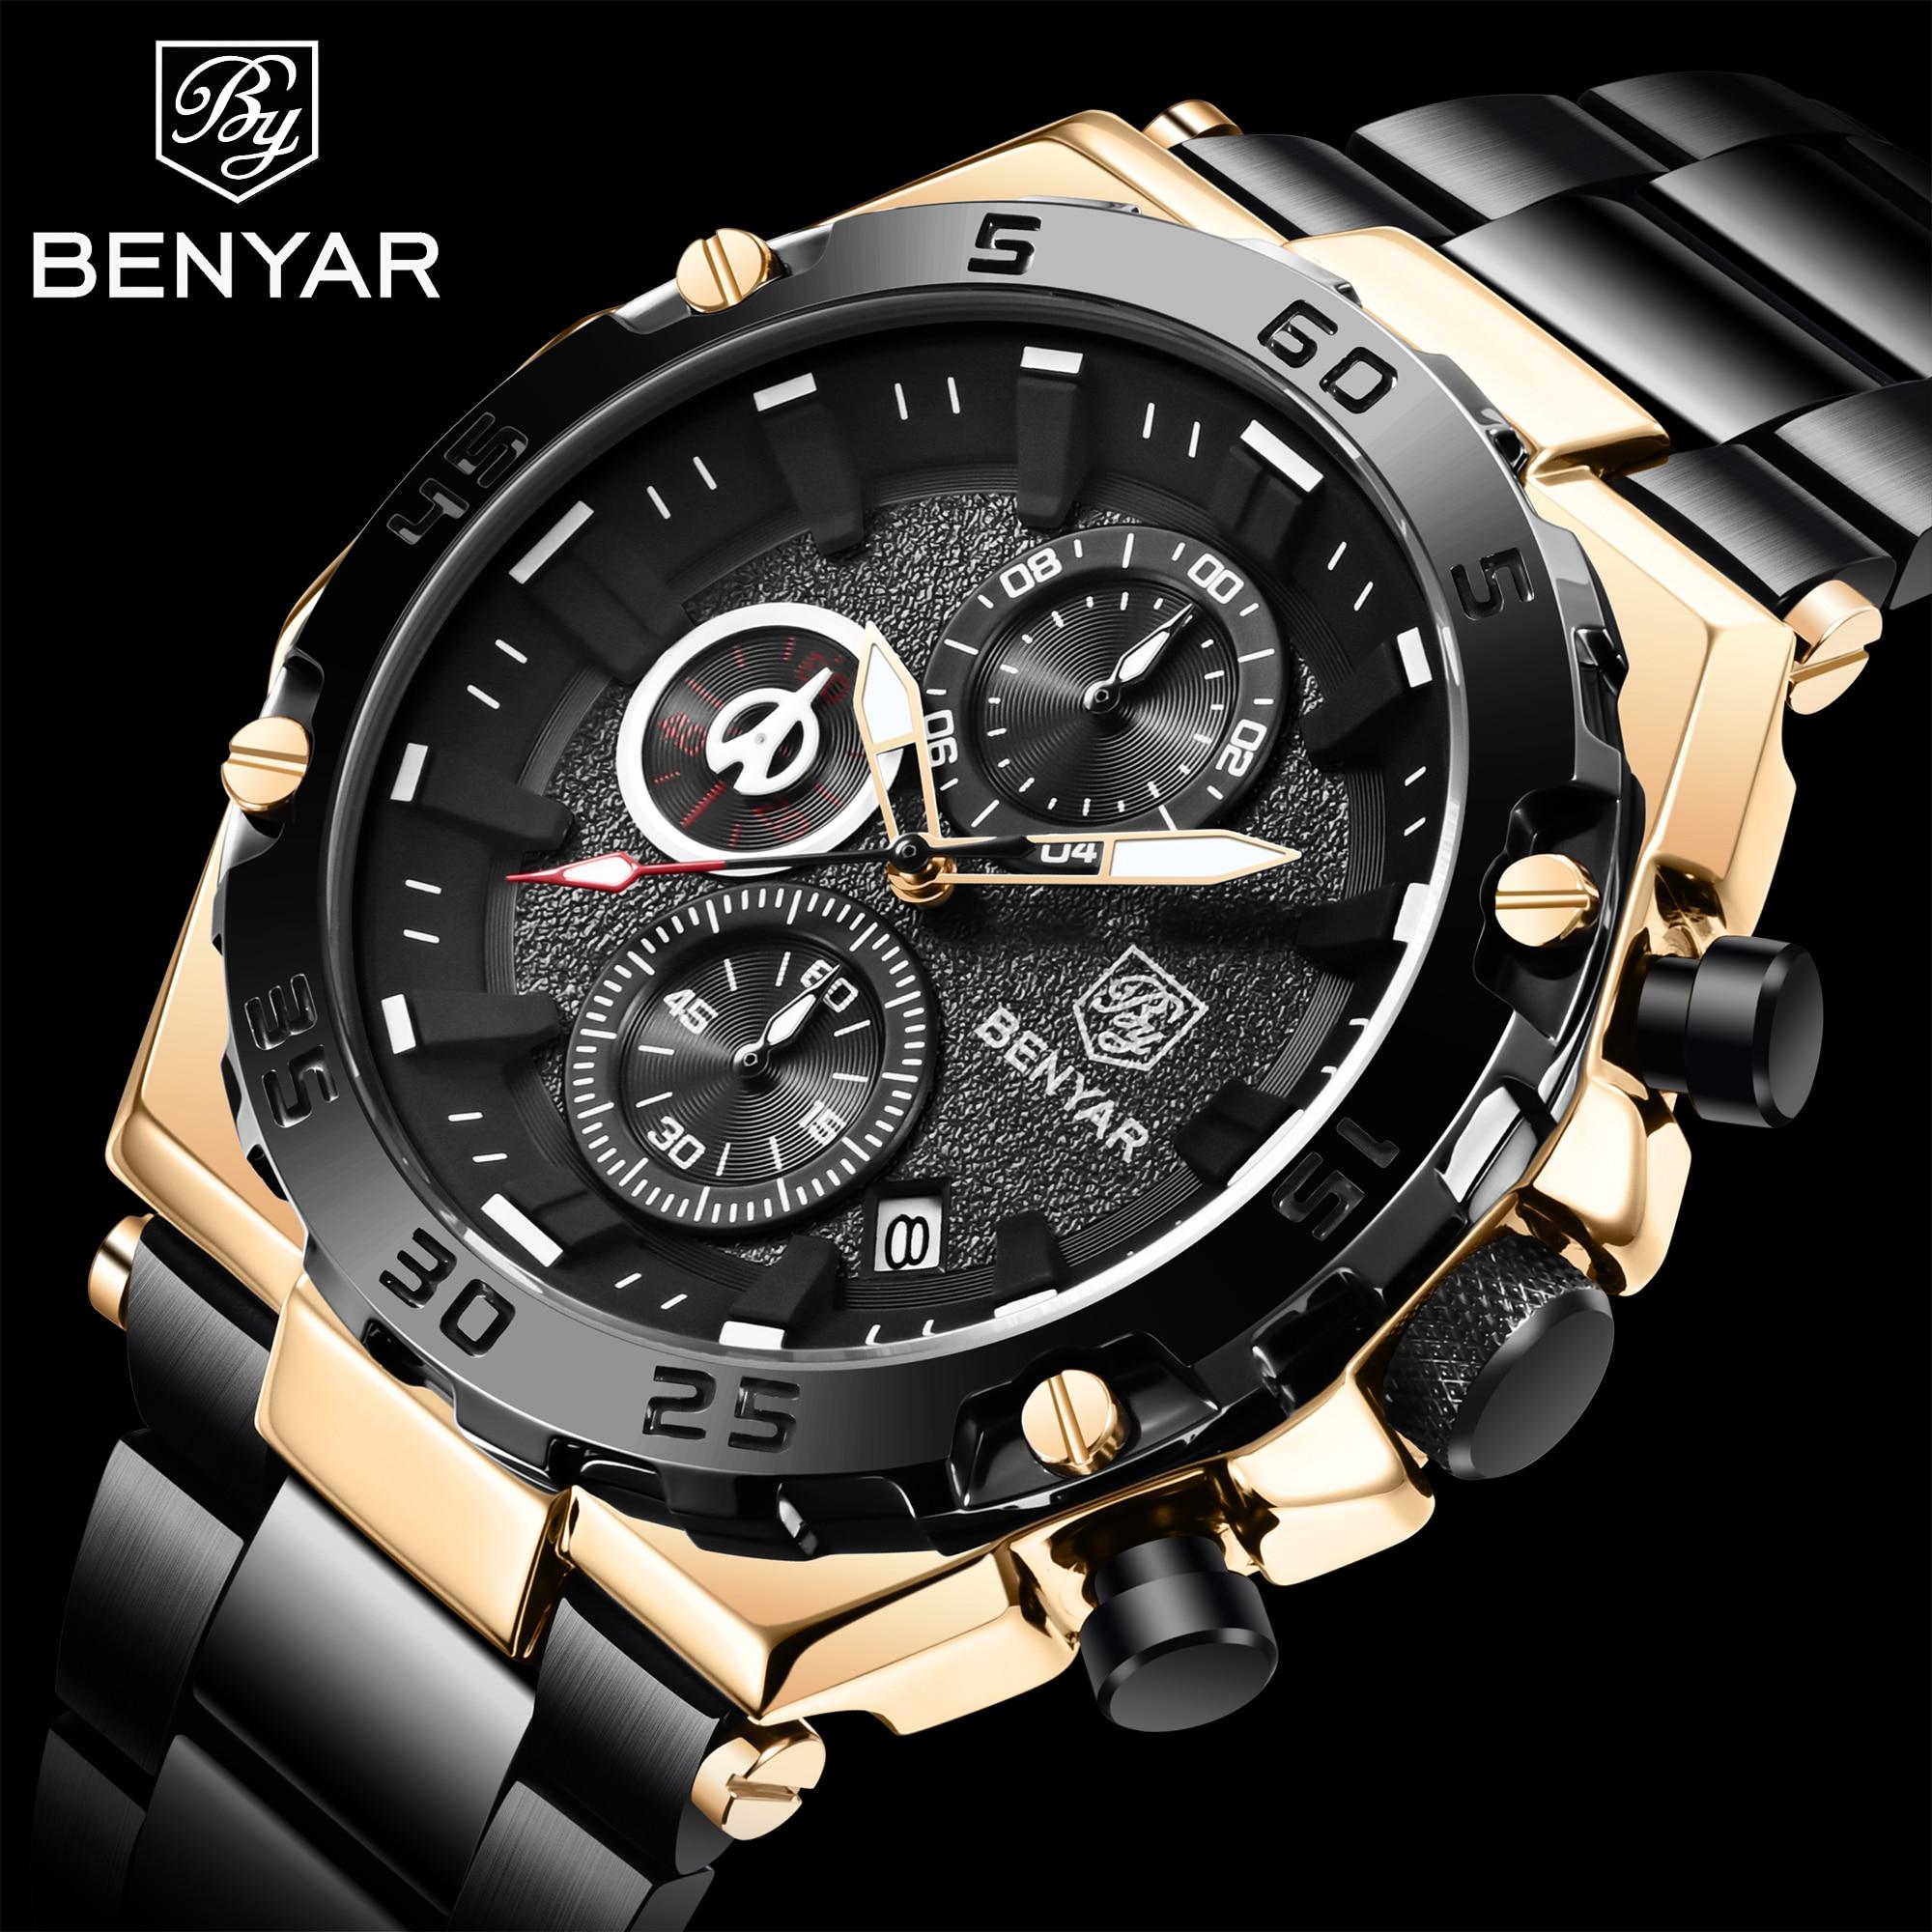 Benyar 2021 جديد العلامة التجارية الفاخرة ساعة كوارتز الرجال الرياضة متعددة الوظائف رمز الوقت الجدول 30 متر مقاوم للماء ساعة Relogio Masculino